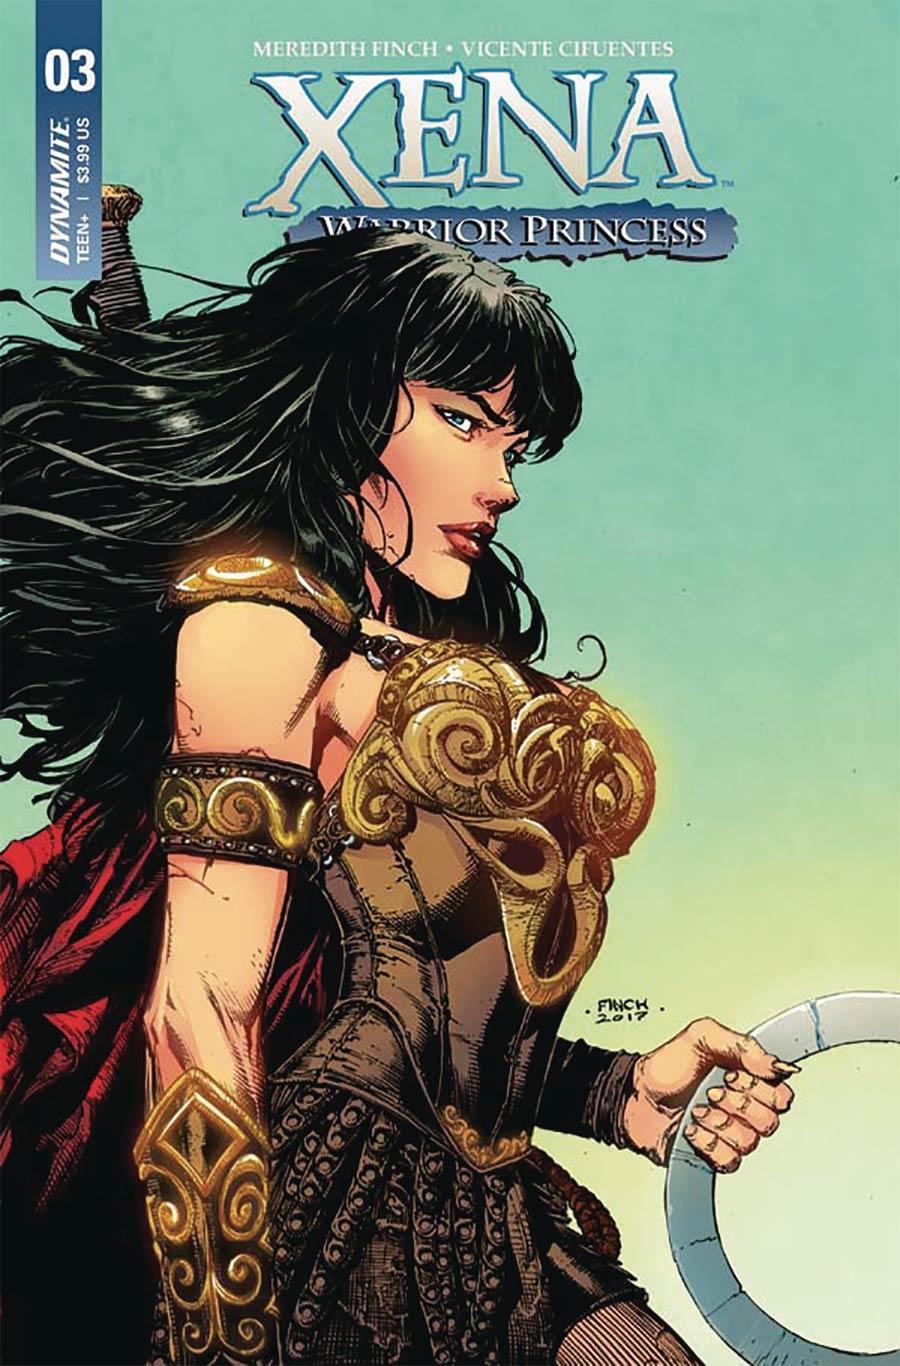 Xena Vol 2 #3 Cover A Regular David Finch Cover